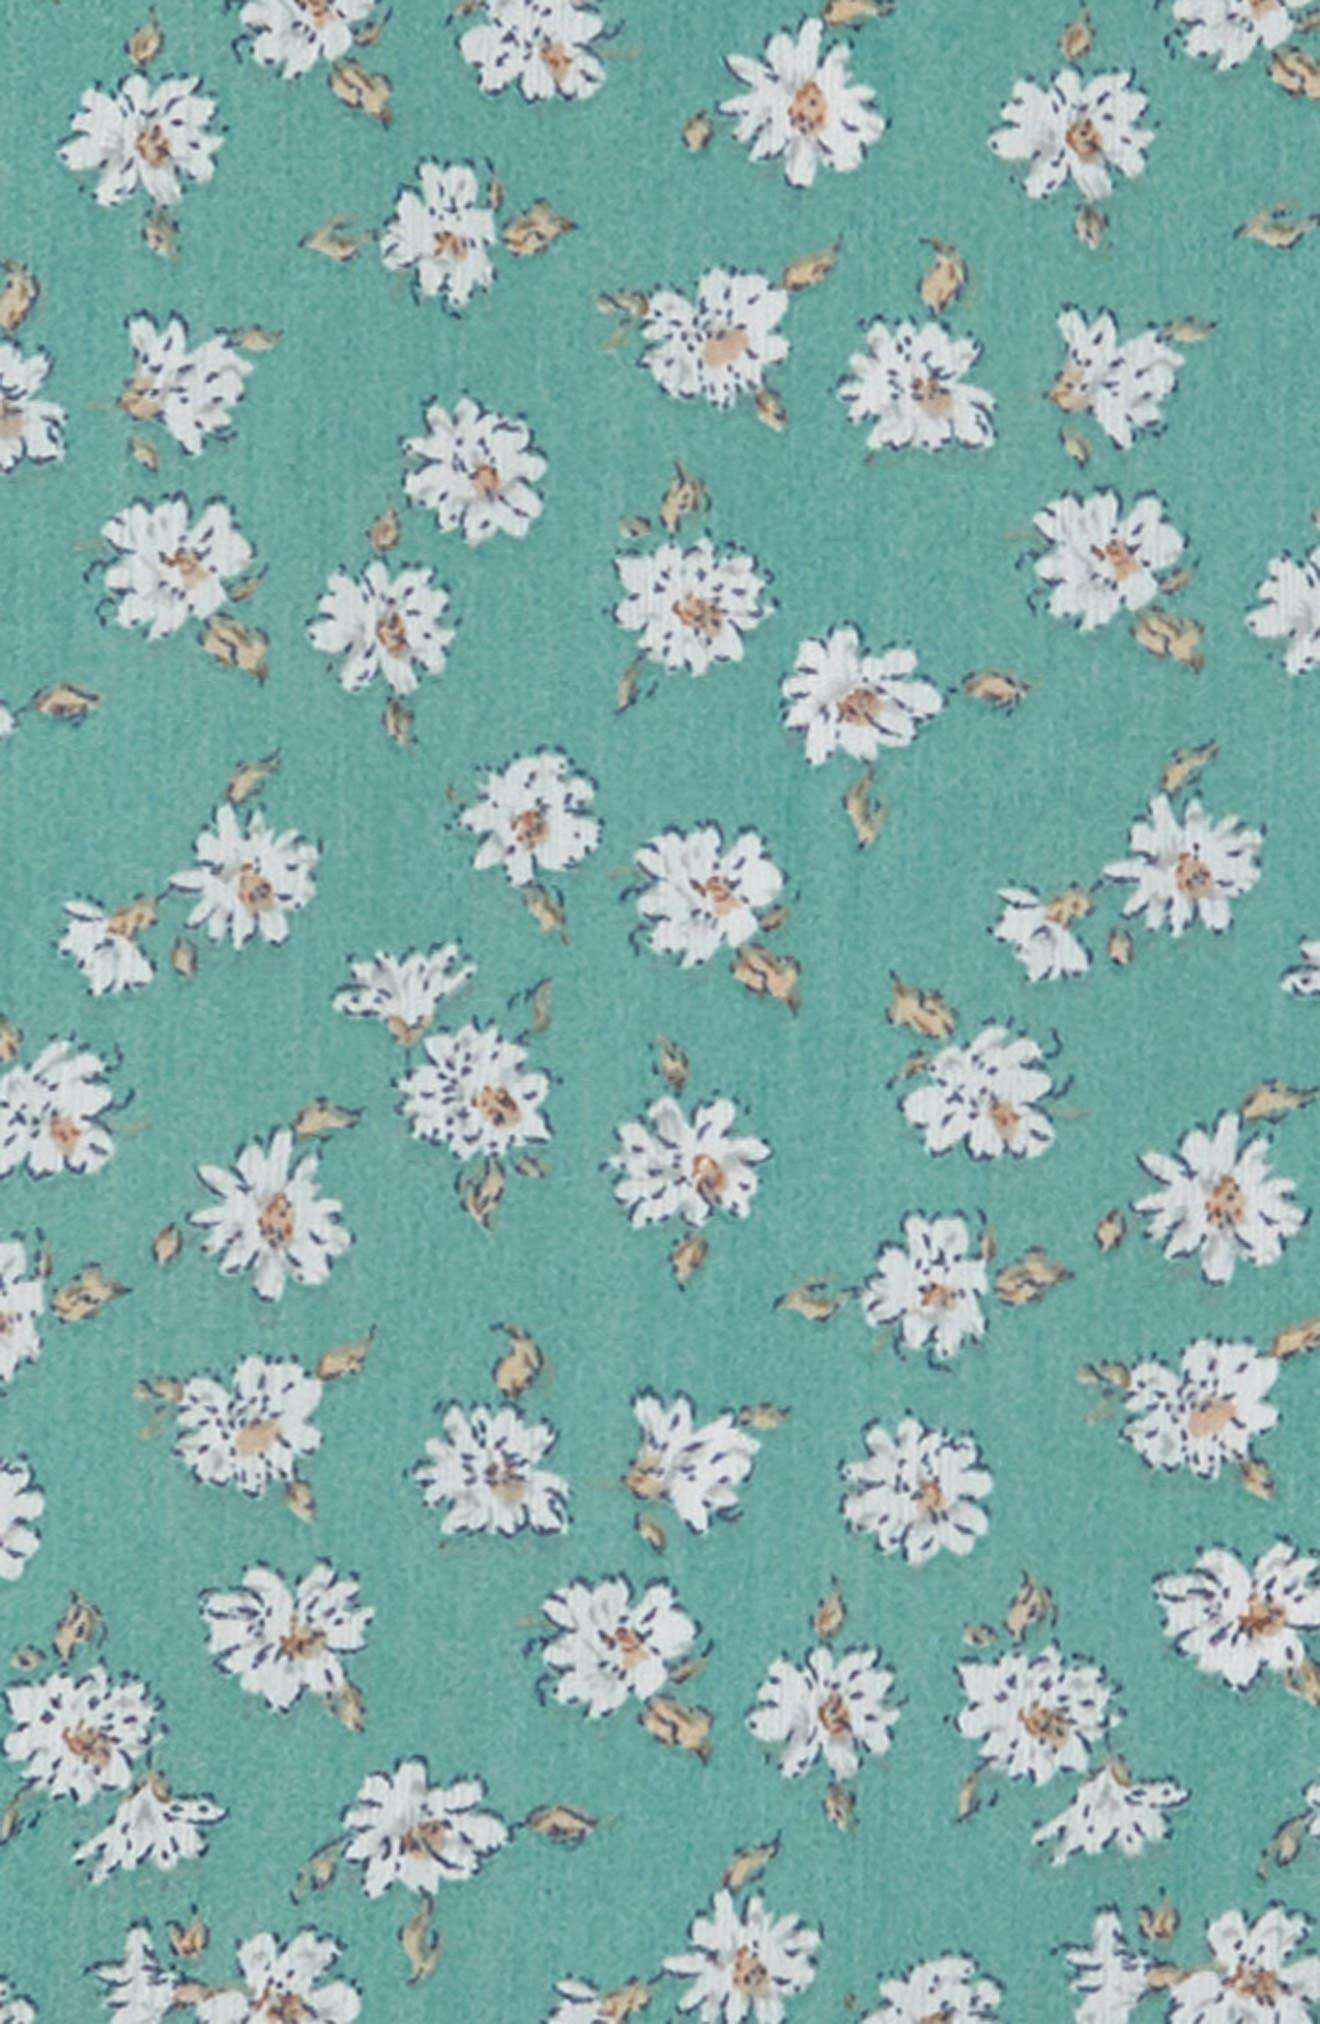 Brooklyn Floral Drop Waist Dress,                             Alternate thumbnail 3, color,                             330